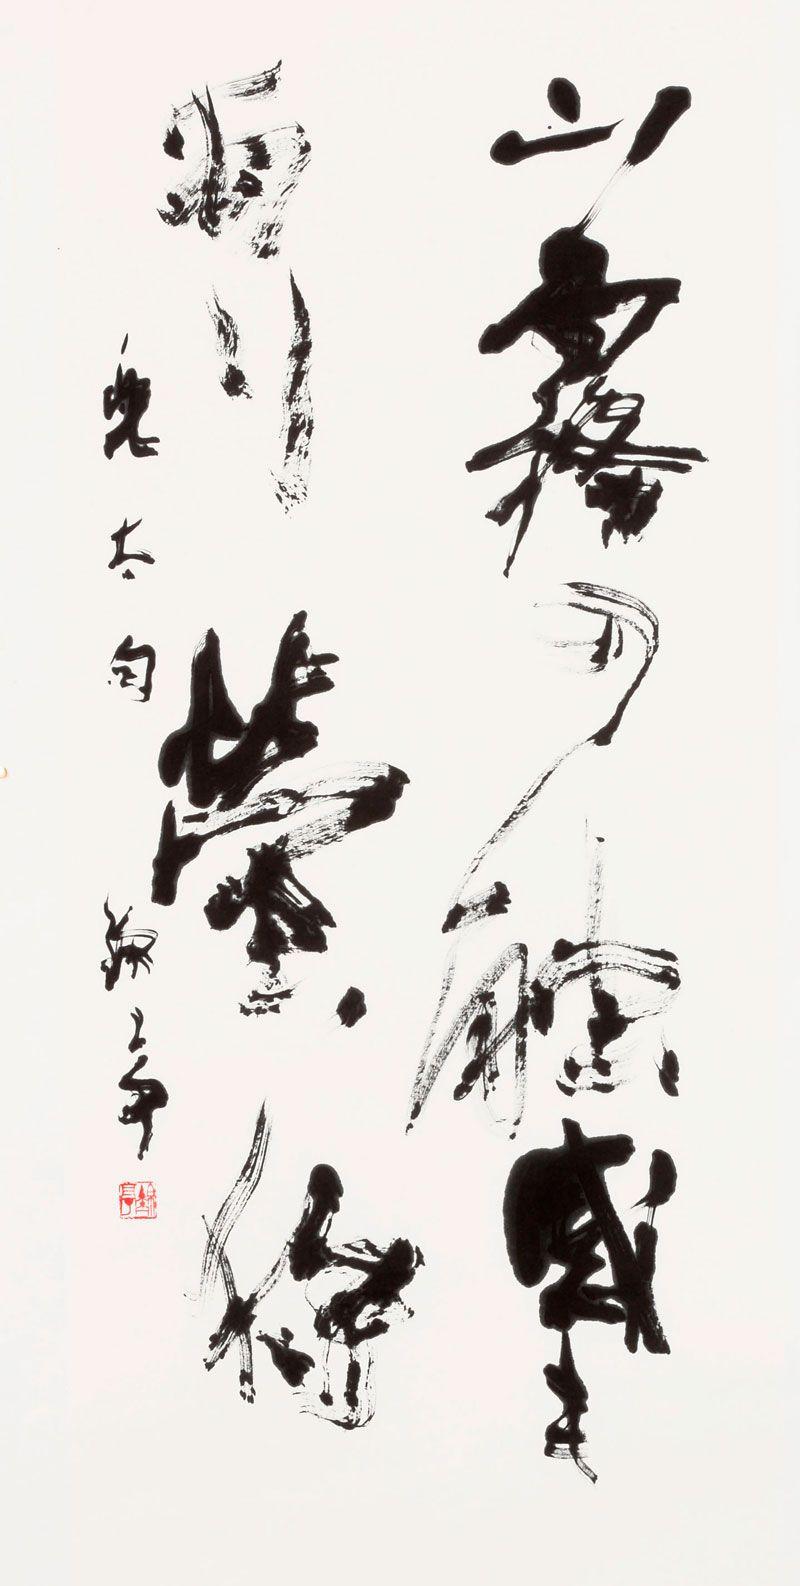 Miho kaneko 1 136 images quotes - Title Towards Kaneko Tota